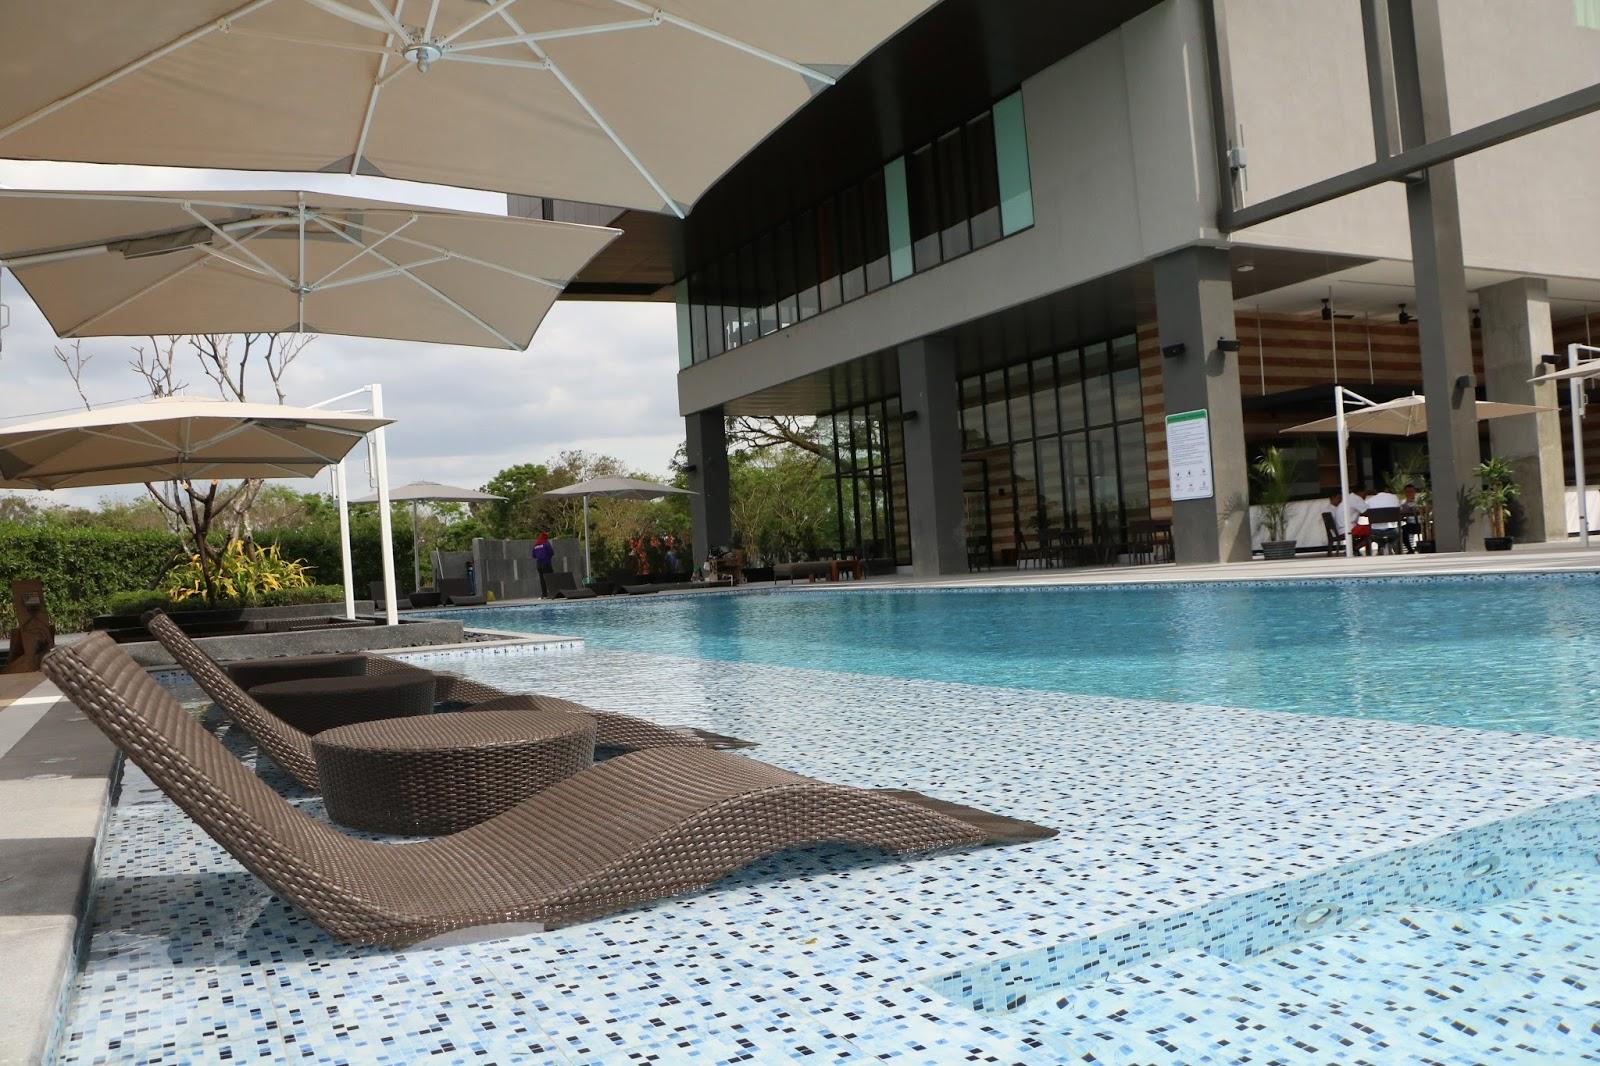 Midori clark hotel and casino for Swimming pool hotel